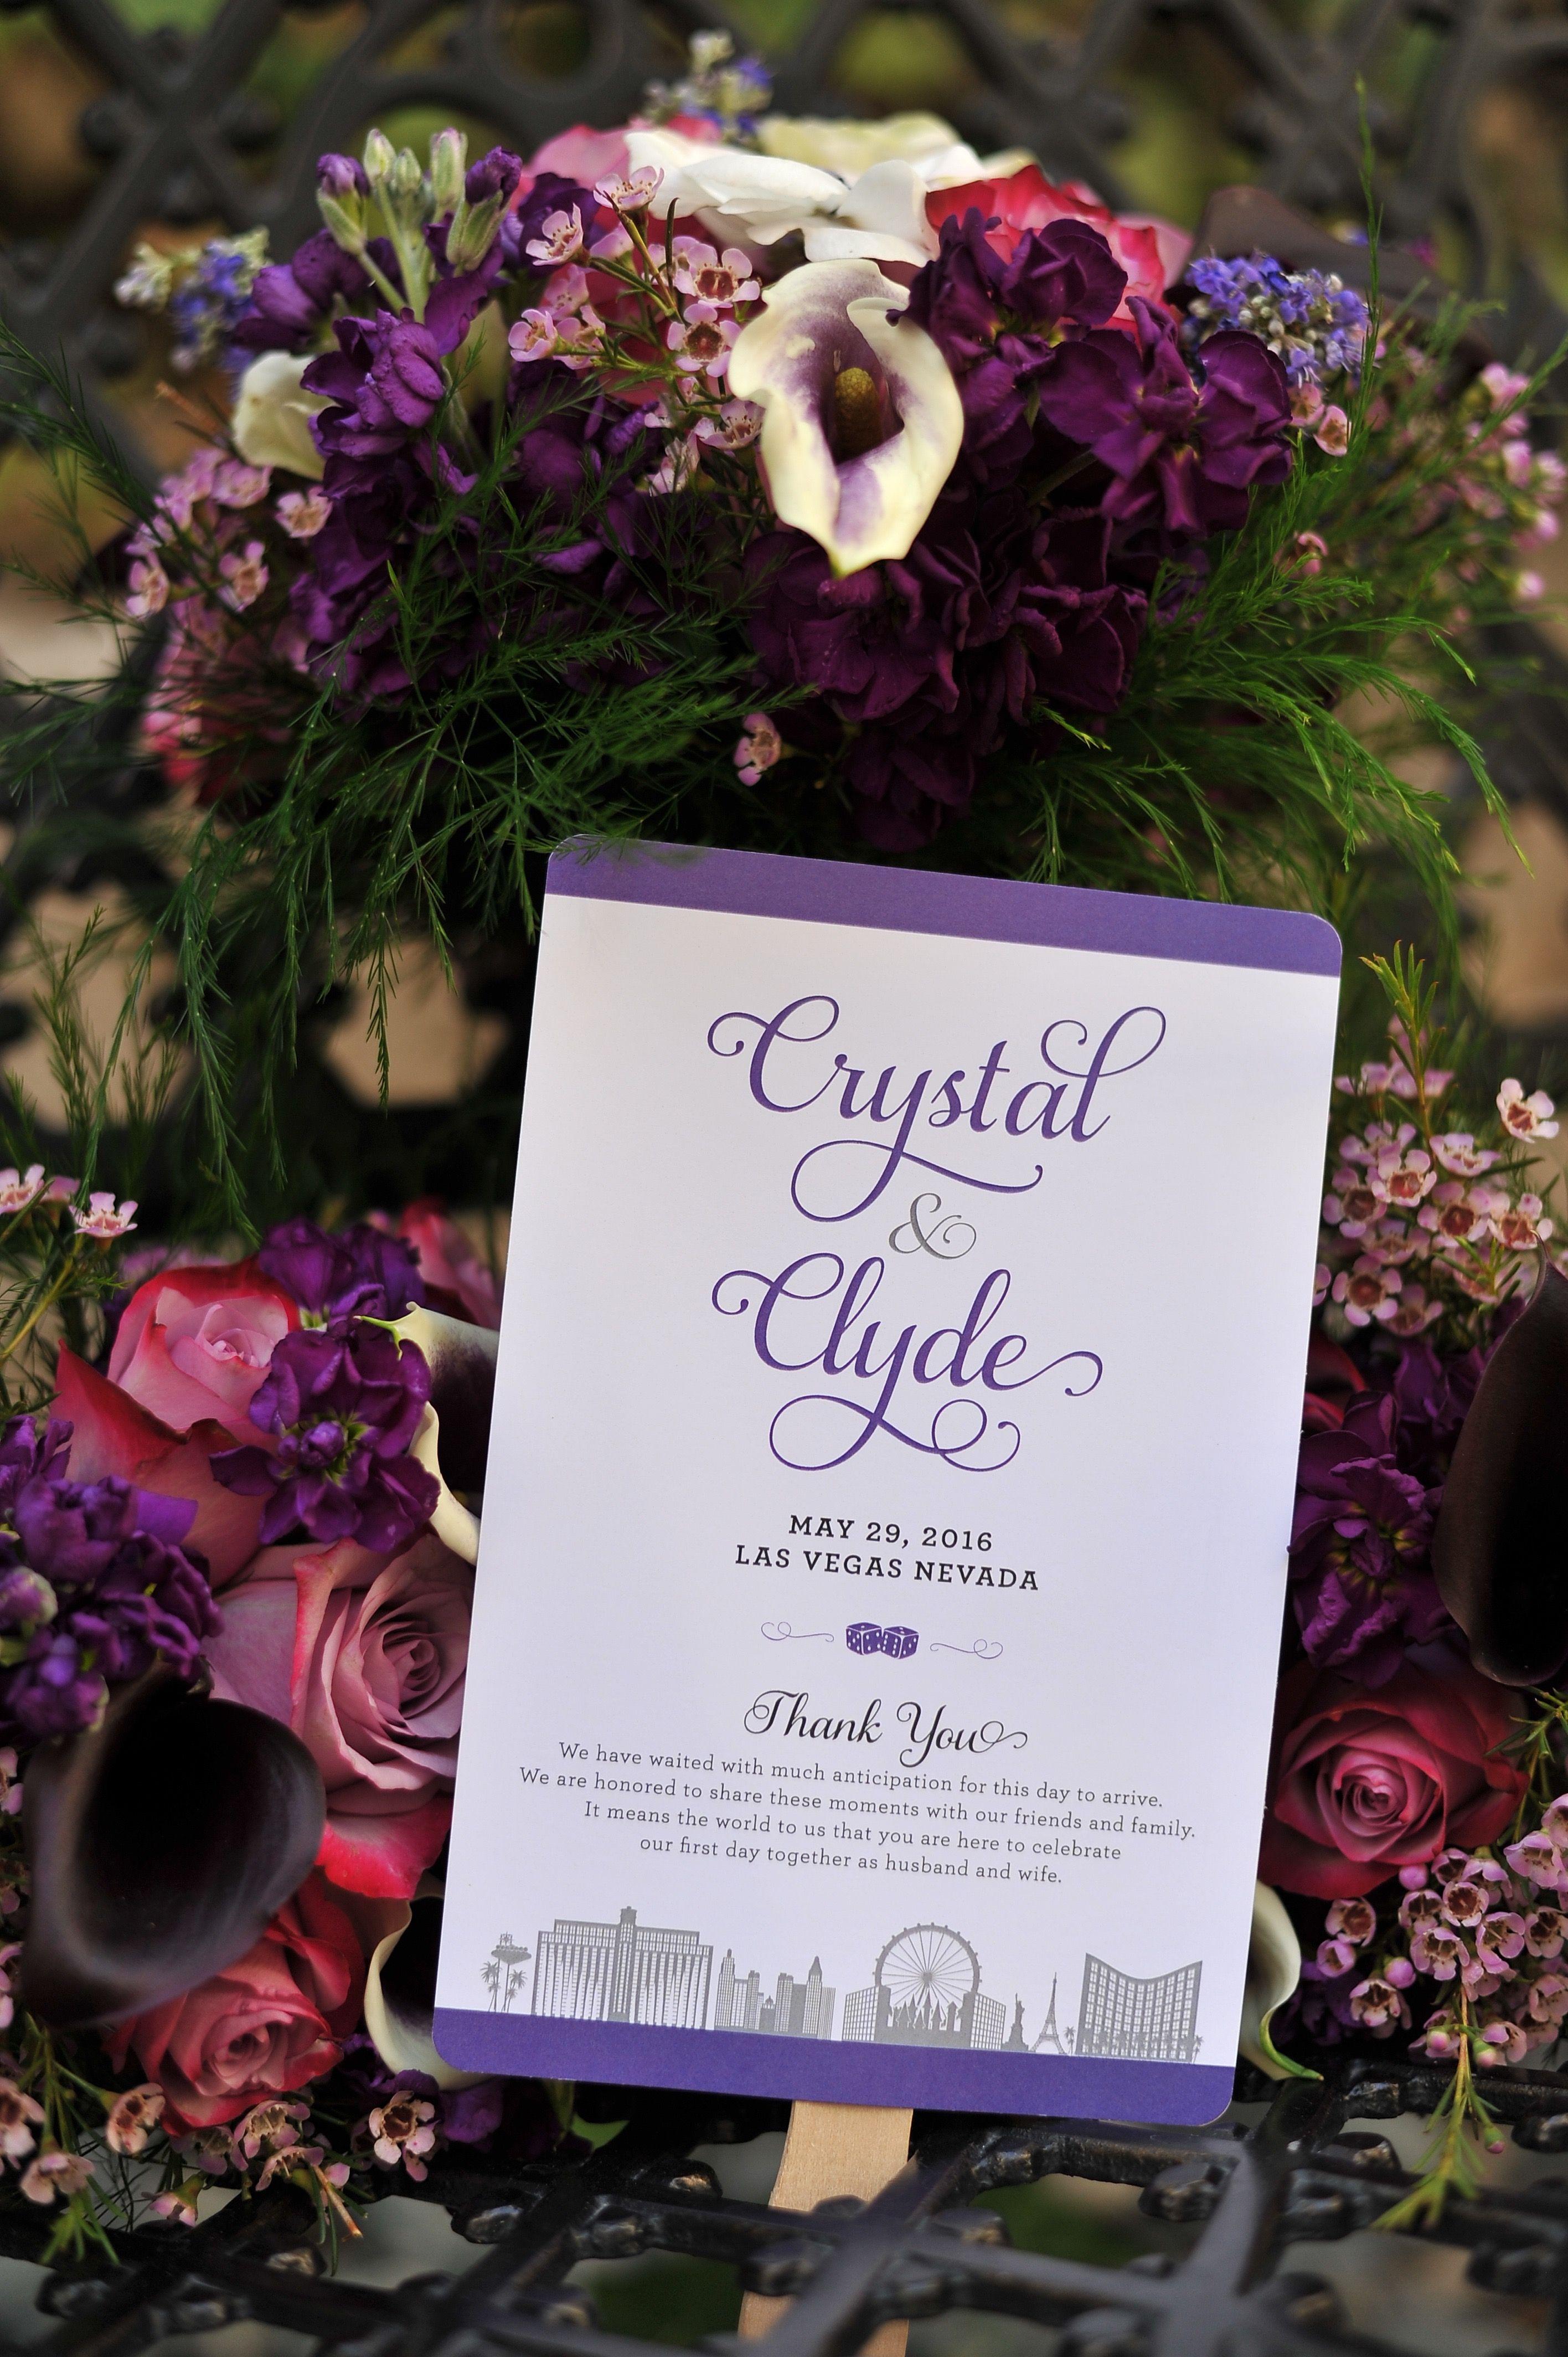 next day wedding invitations%0A Boarding Pass Wedding Invitations